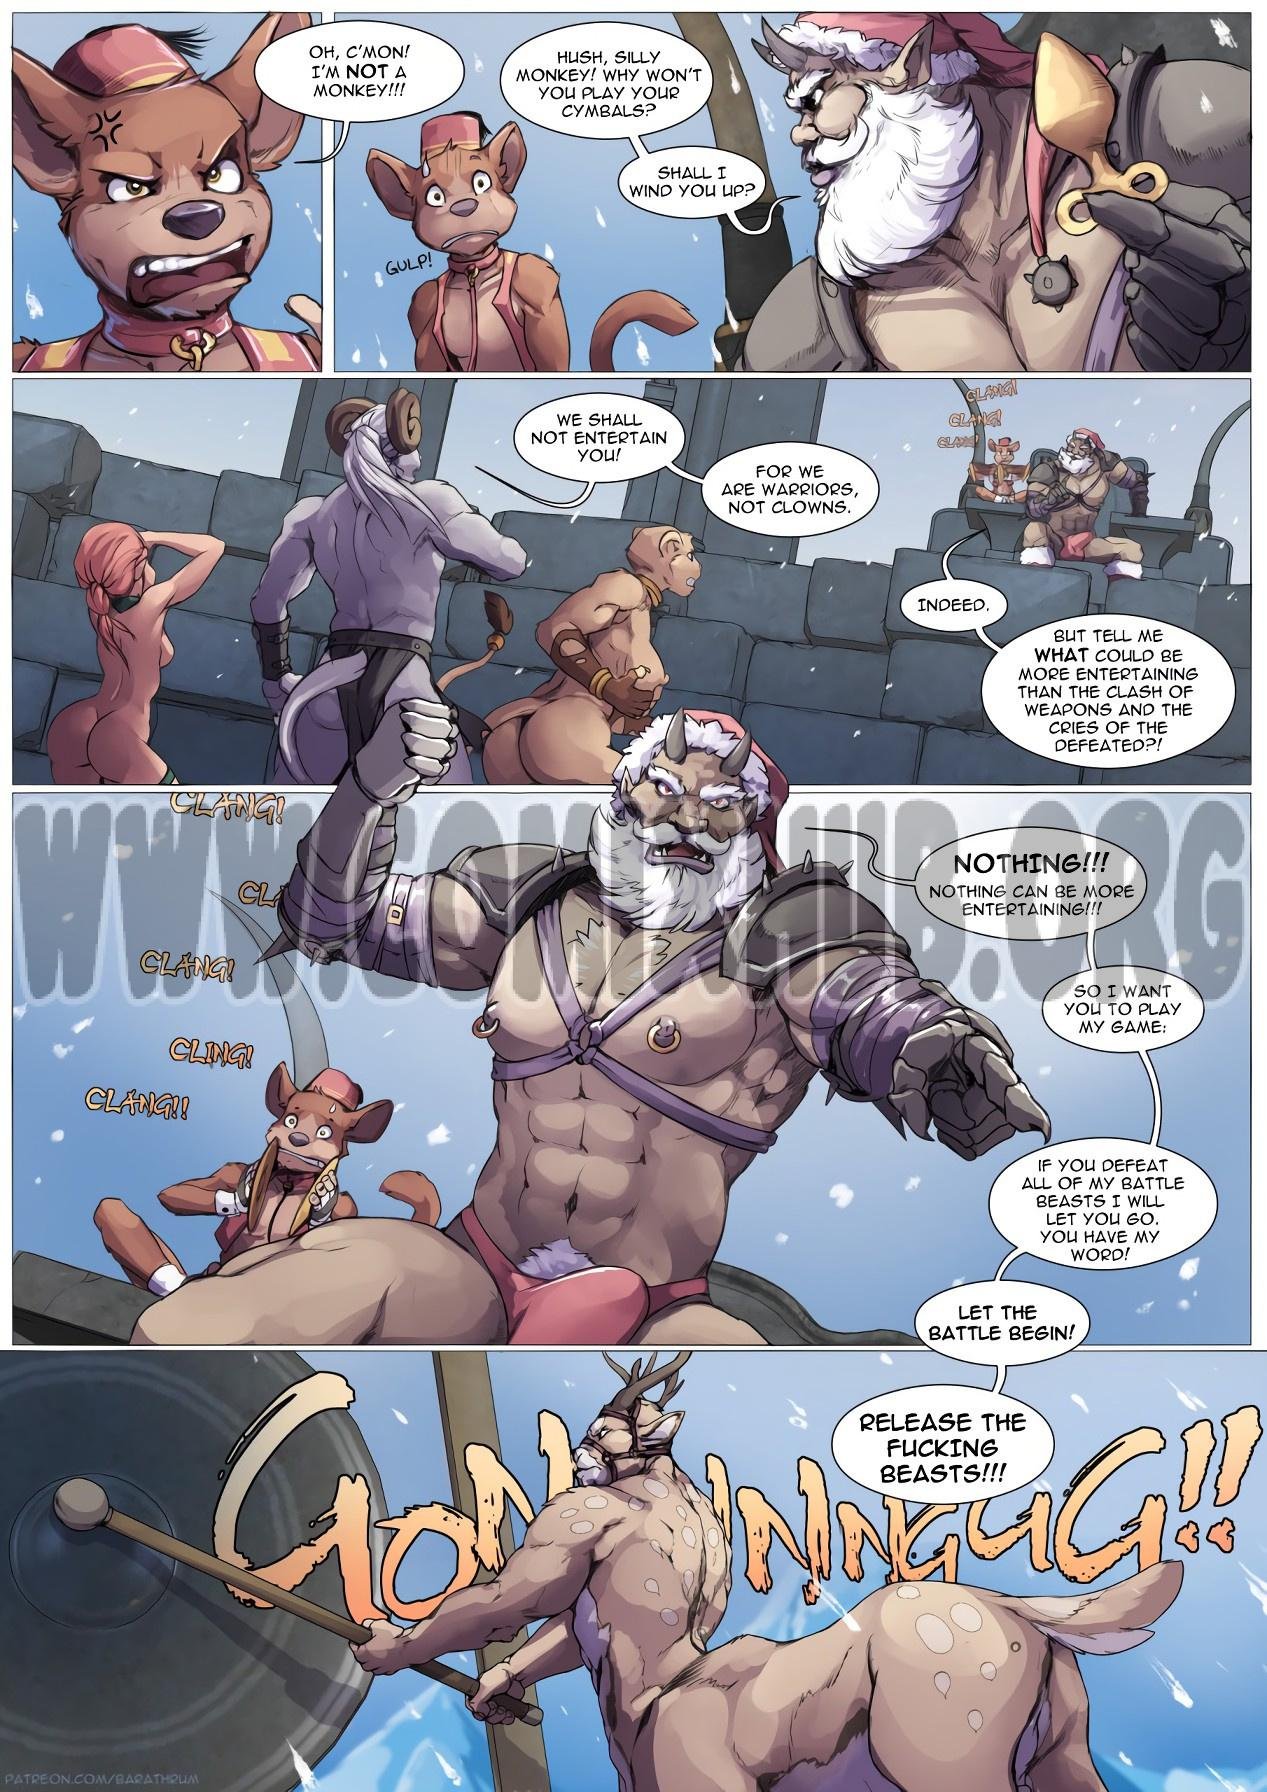 Flurry of Swords! porn comics Oral sex, Anal Sex, BDSM, Blowjob, cunnilingus, Domination, Fantasy, Furry, Futanari, Rape